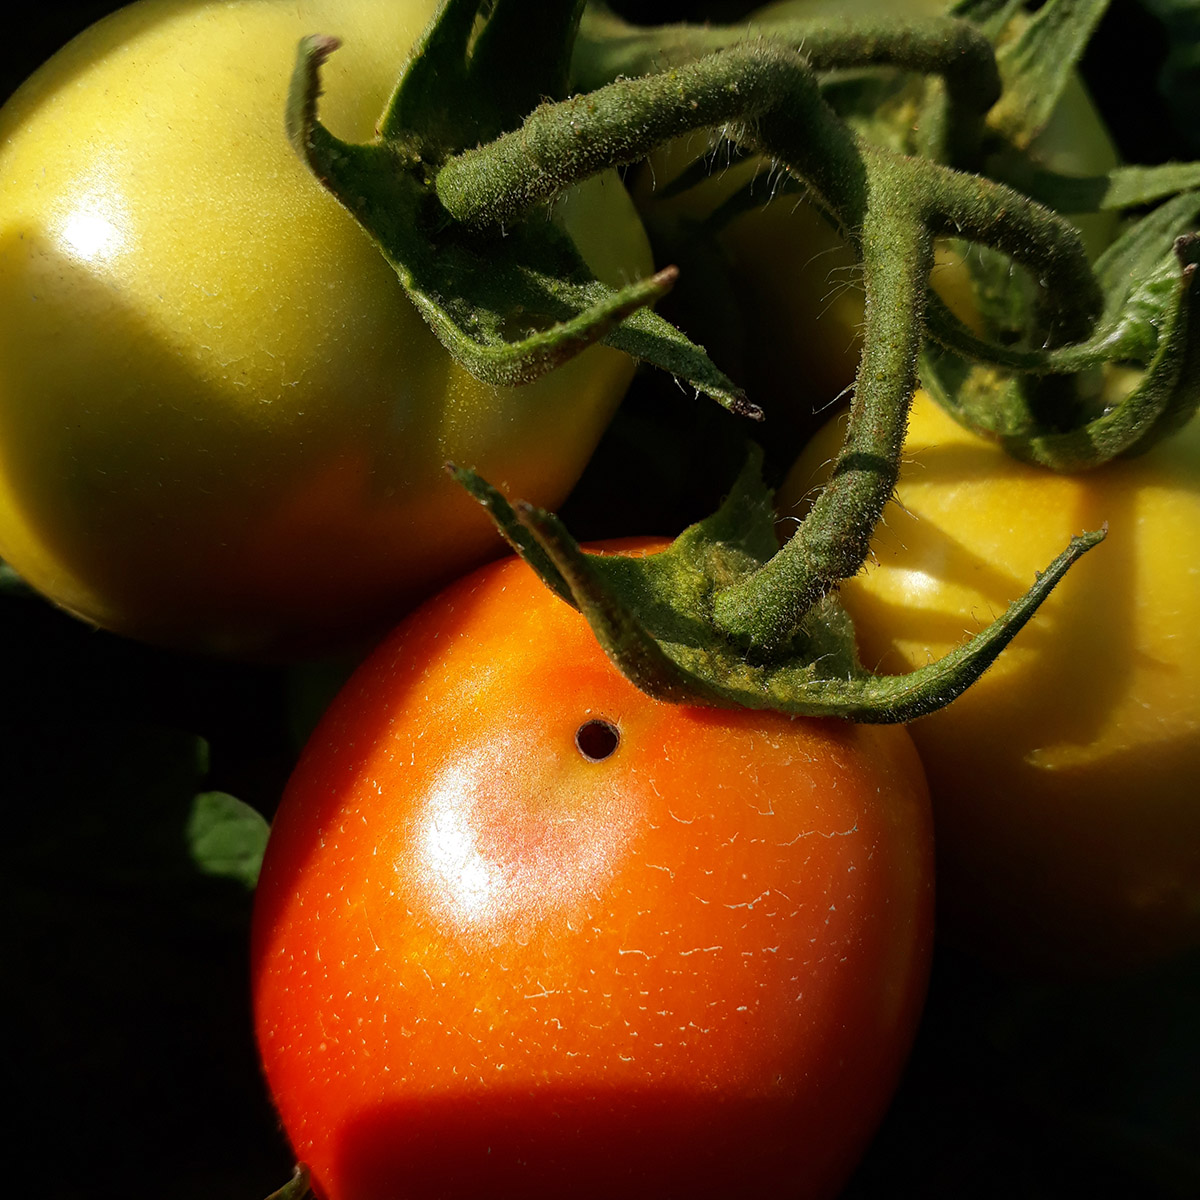 Mineuse tomate dégâts